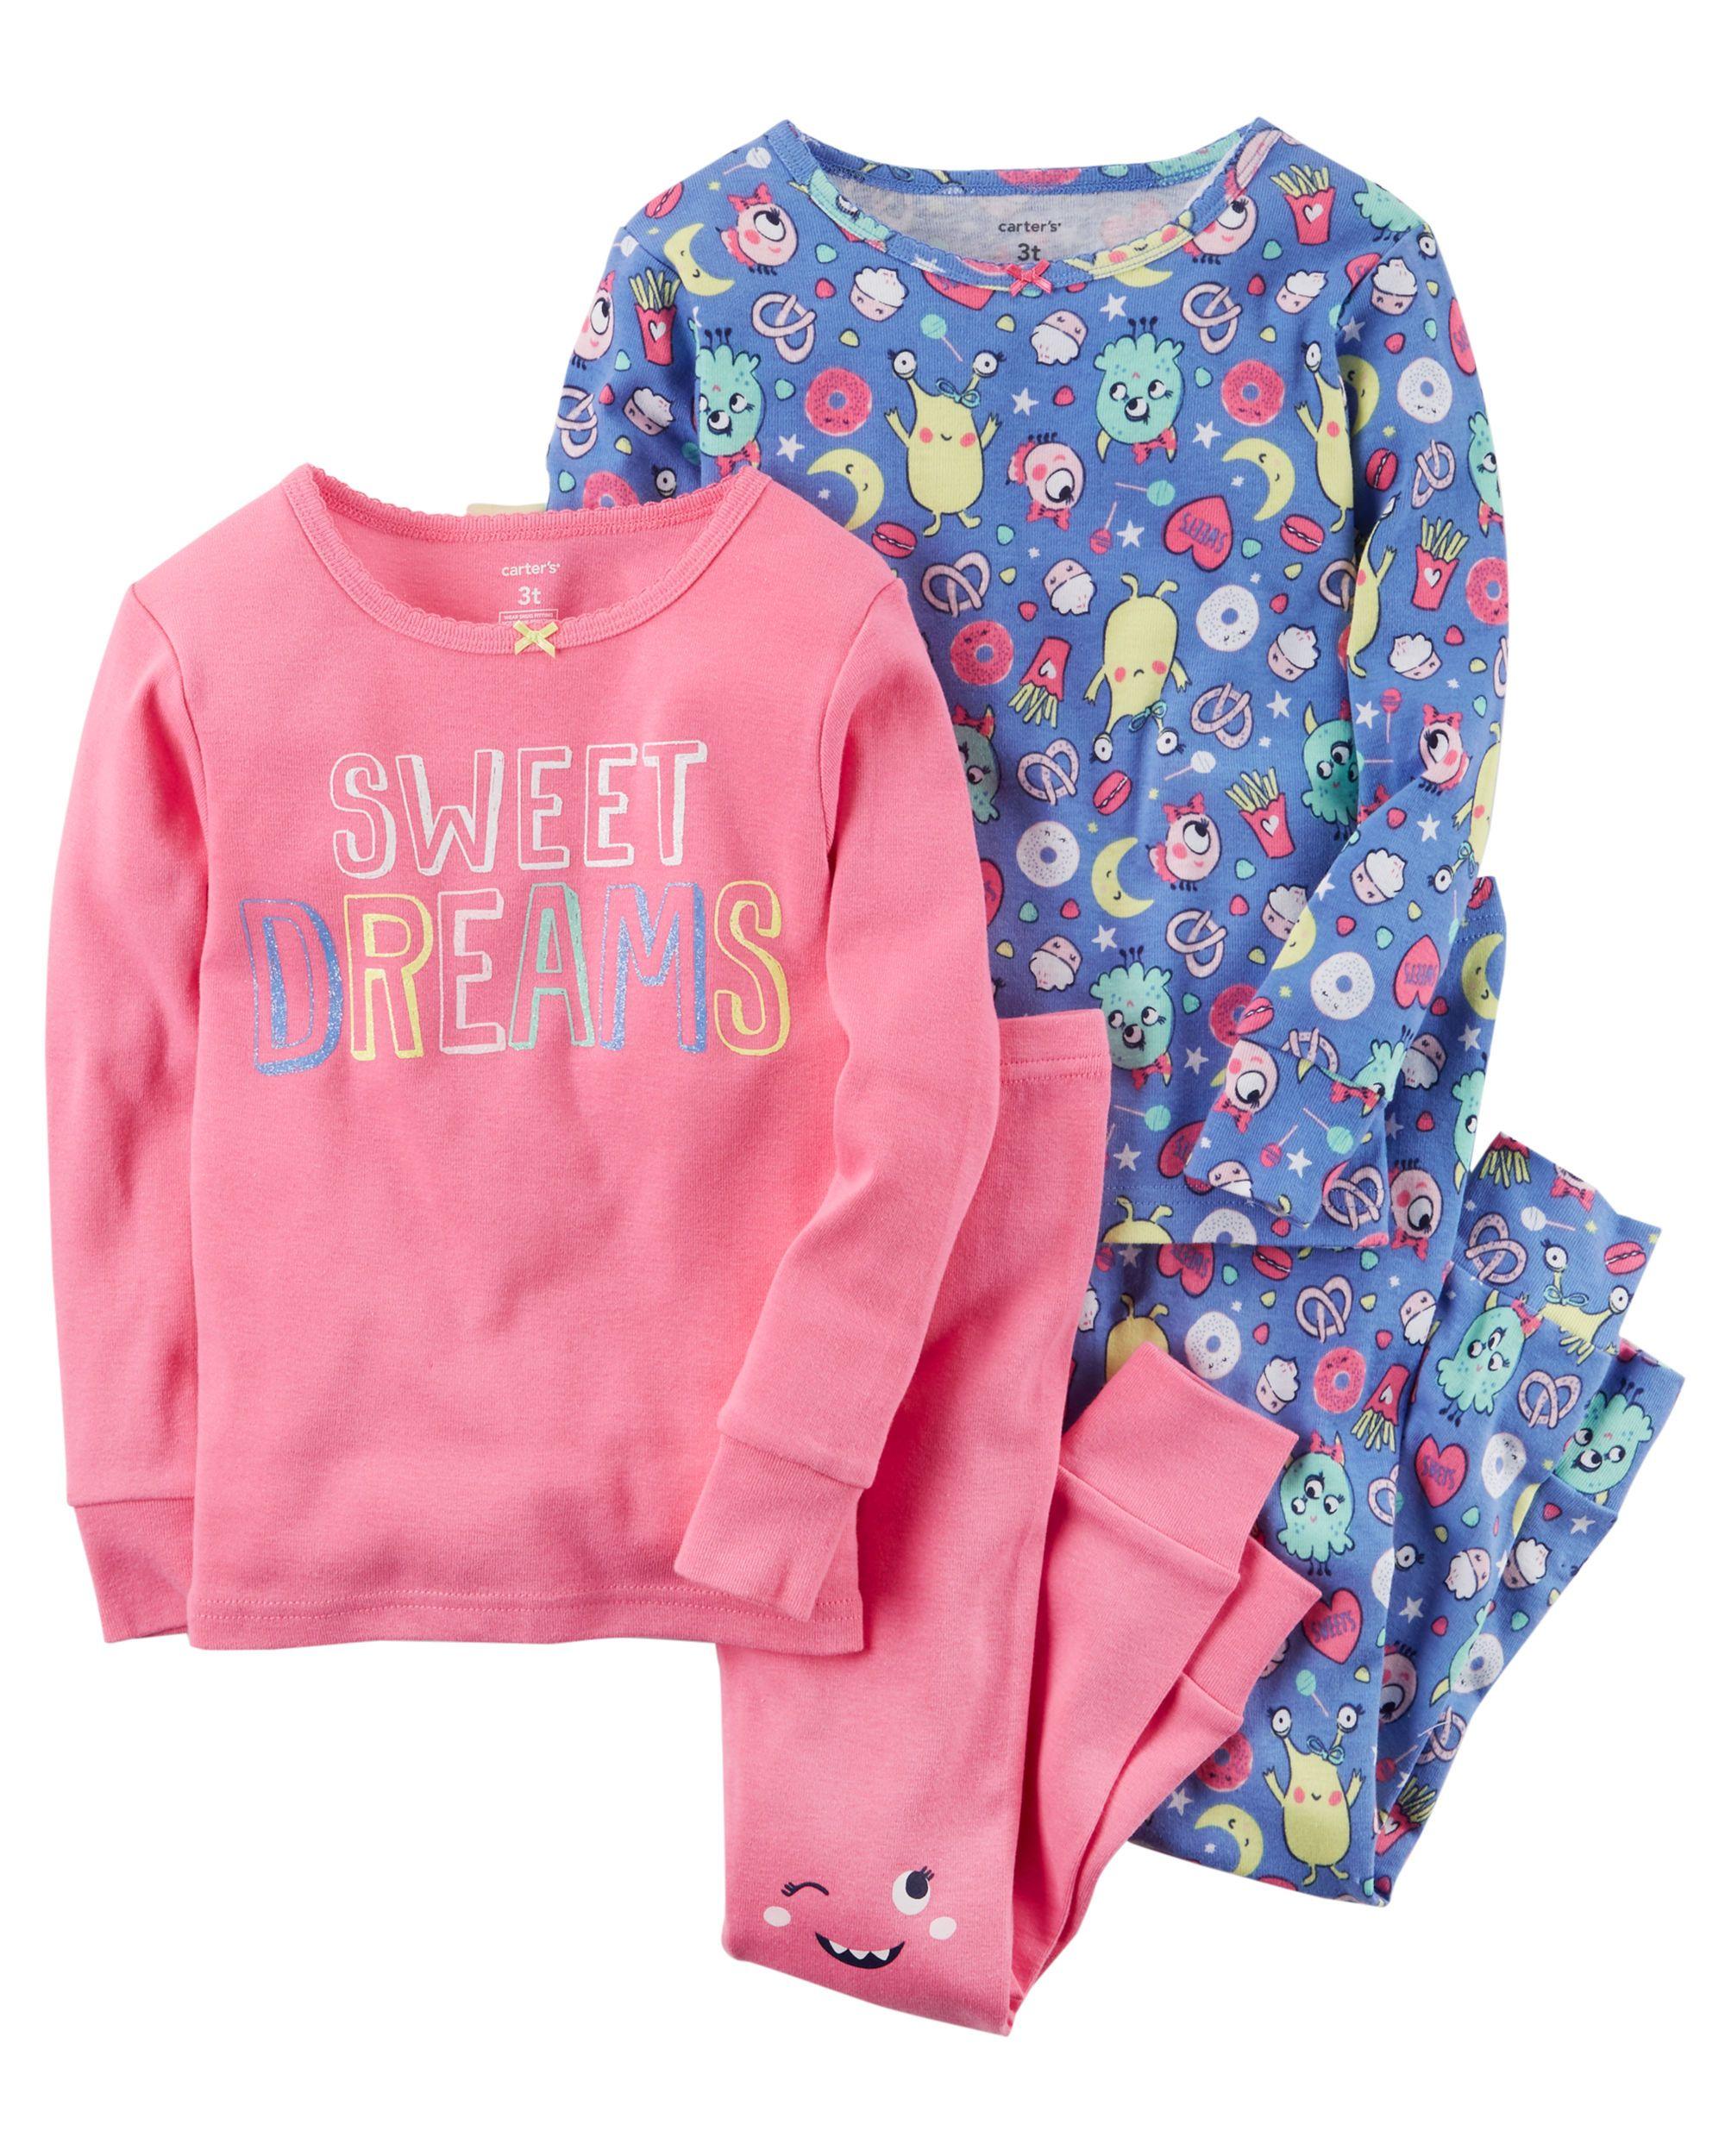 c6f4bf95a650 4-Piece Sweet Dreams Snug Fit Cotton PJs